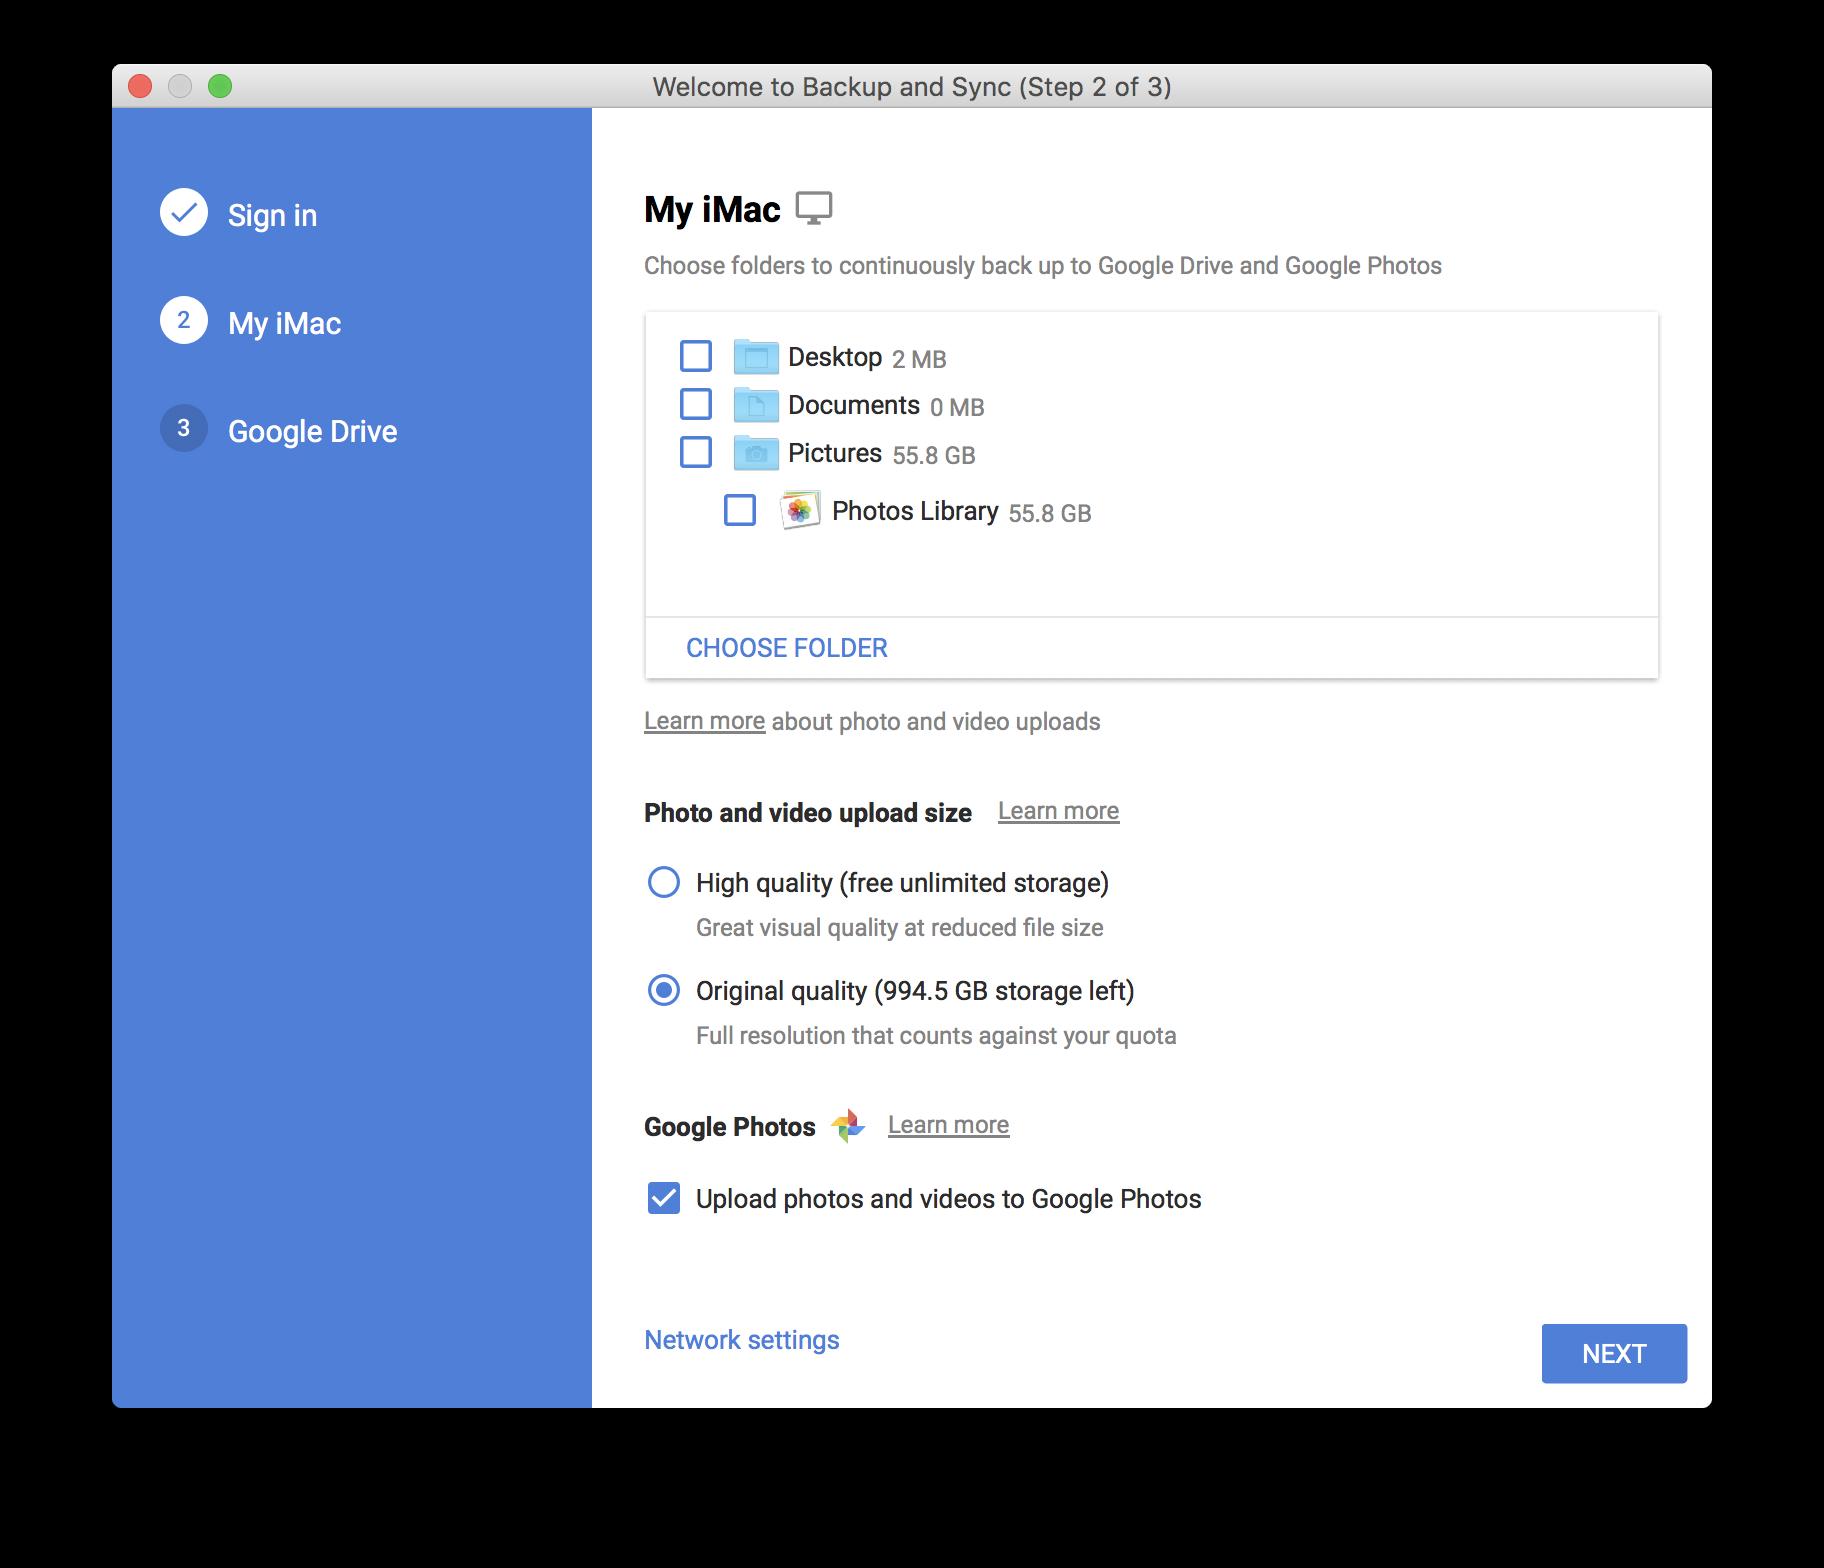 Sync Network Folder To Google Drive